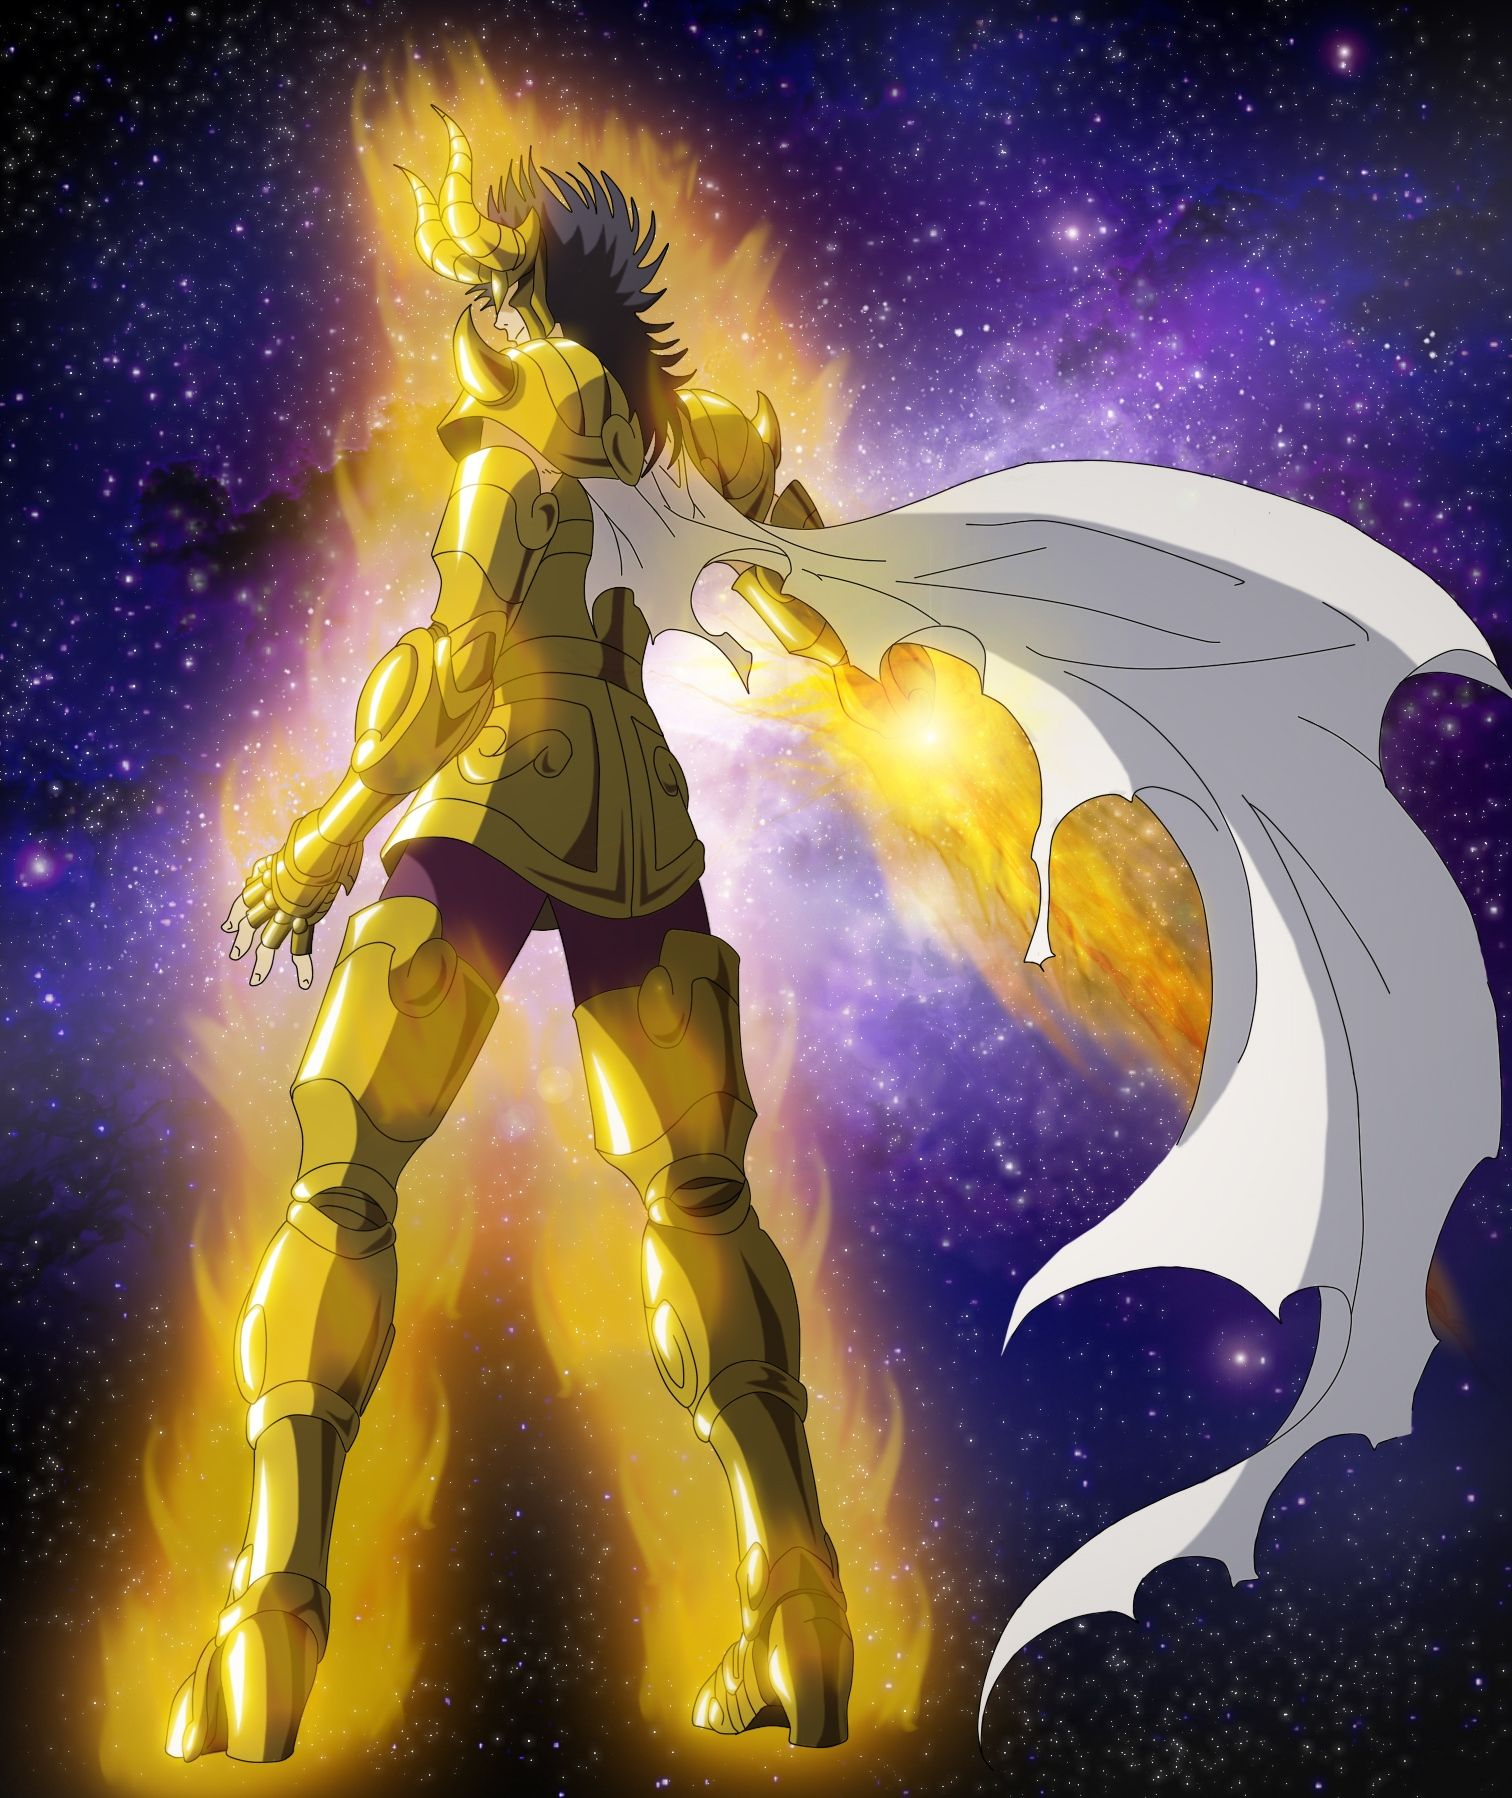 Gold Saint Capricorn El Cid By Erushido